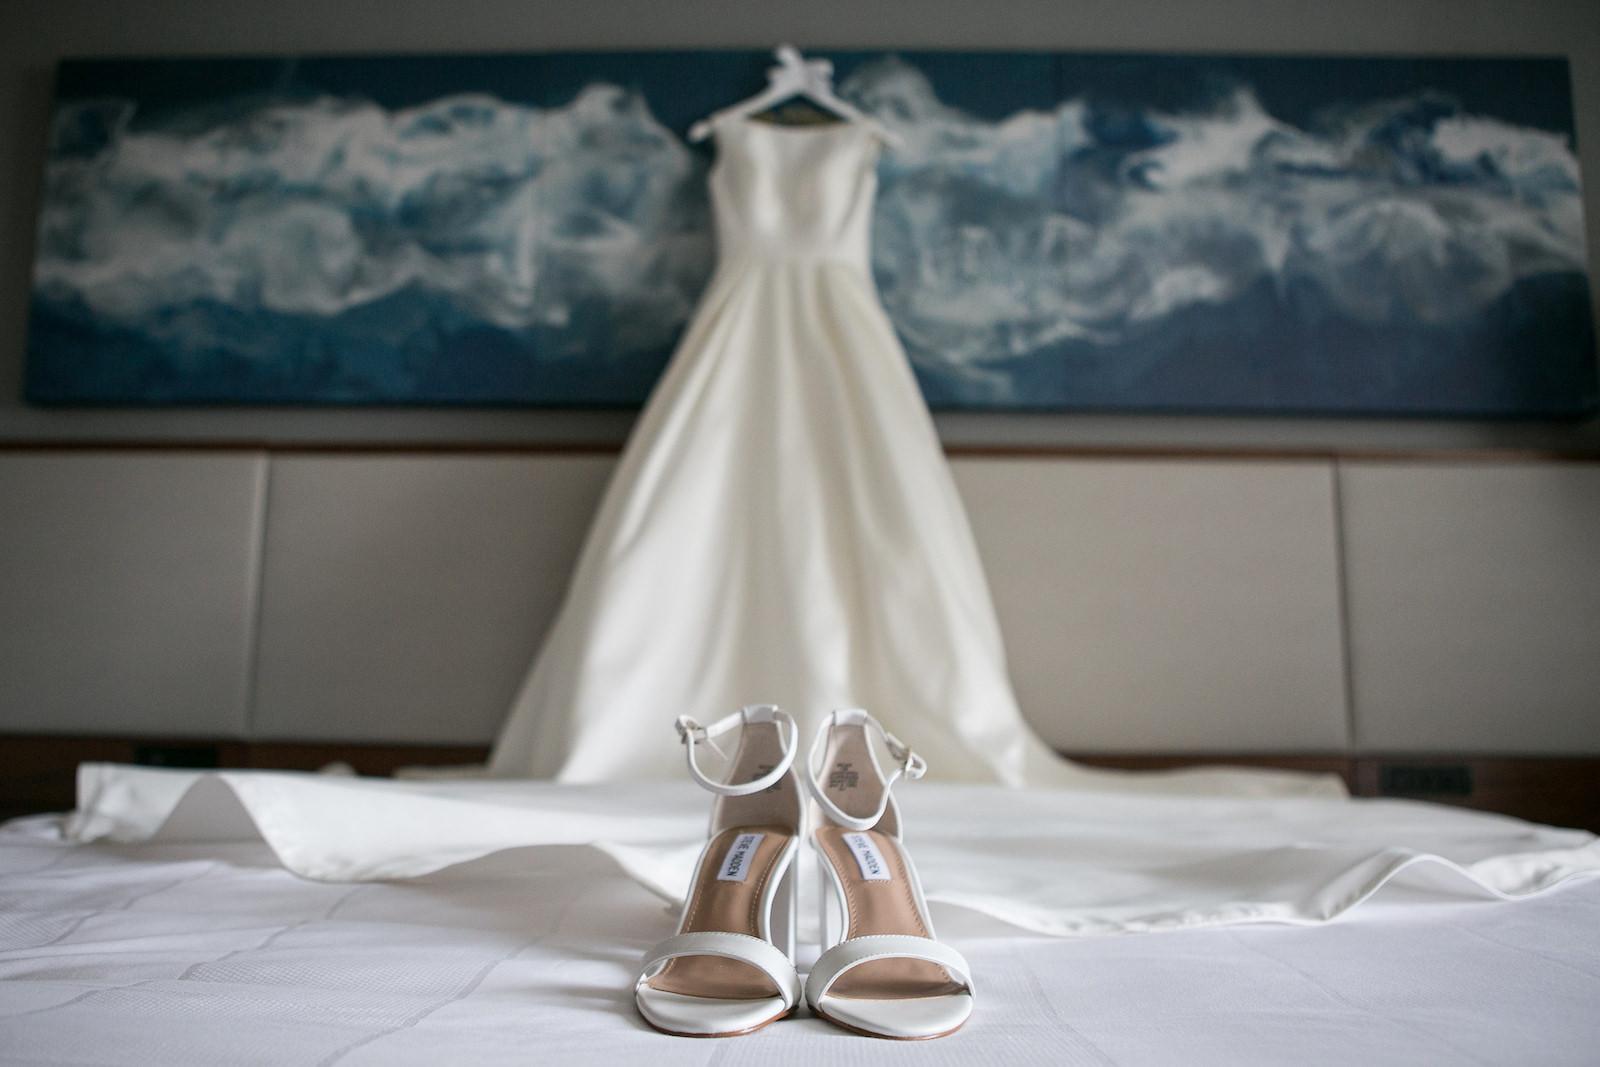 Wedding Dress Hanger Shot | Bateau Neck Mikado Satin Martina Liana Simple Elegant Wedding Dress with Ivory Strappy Steve Madden Heels